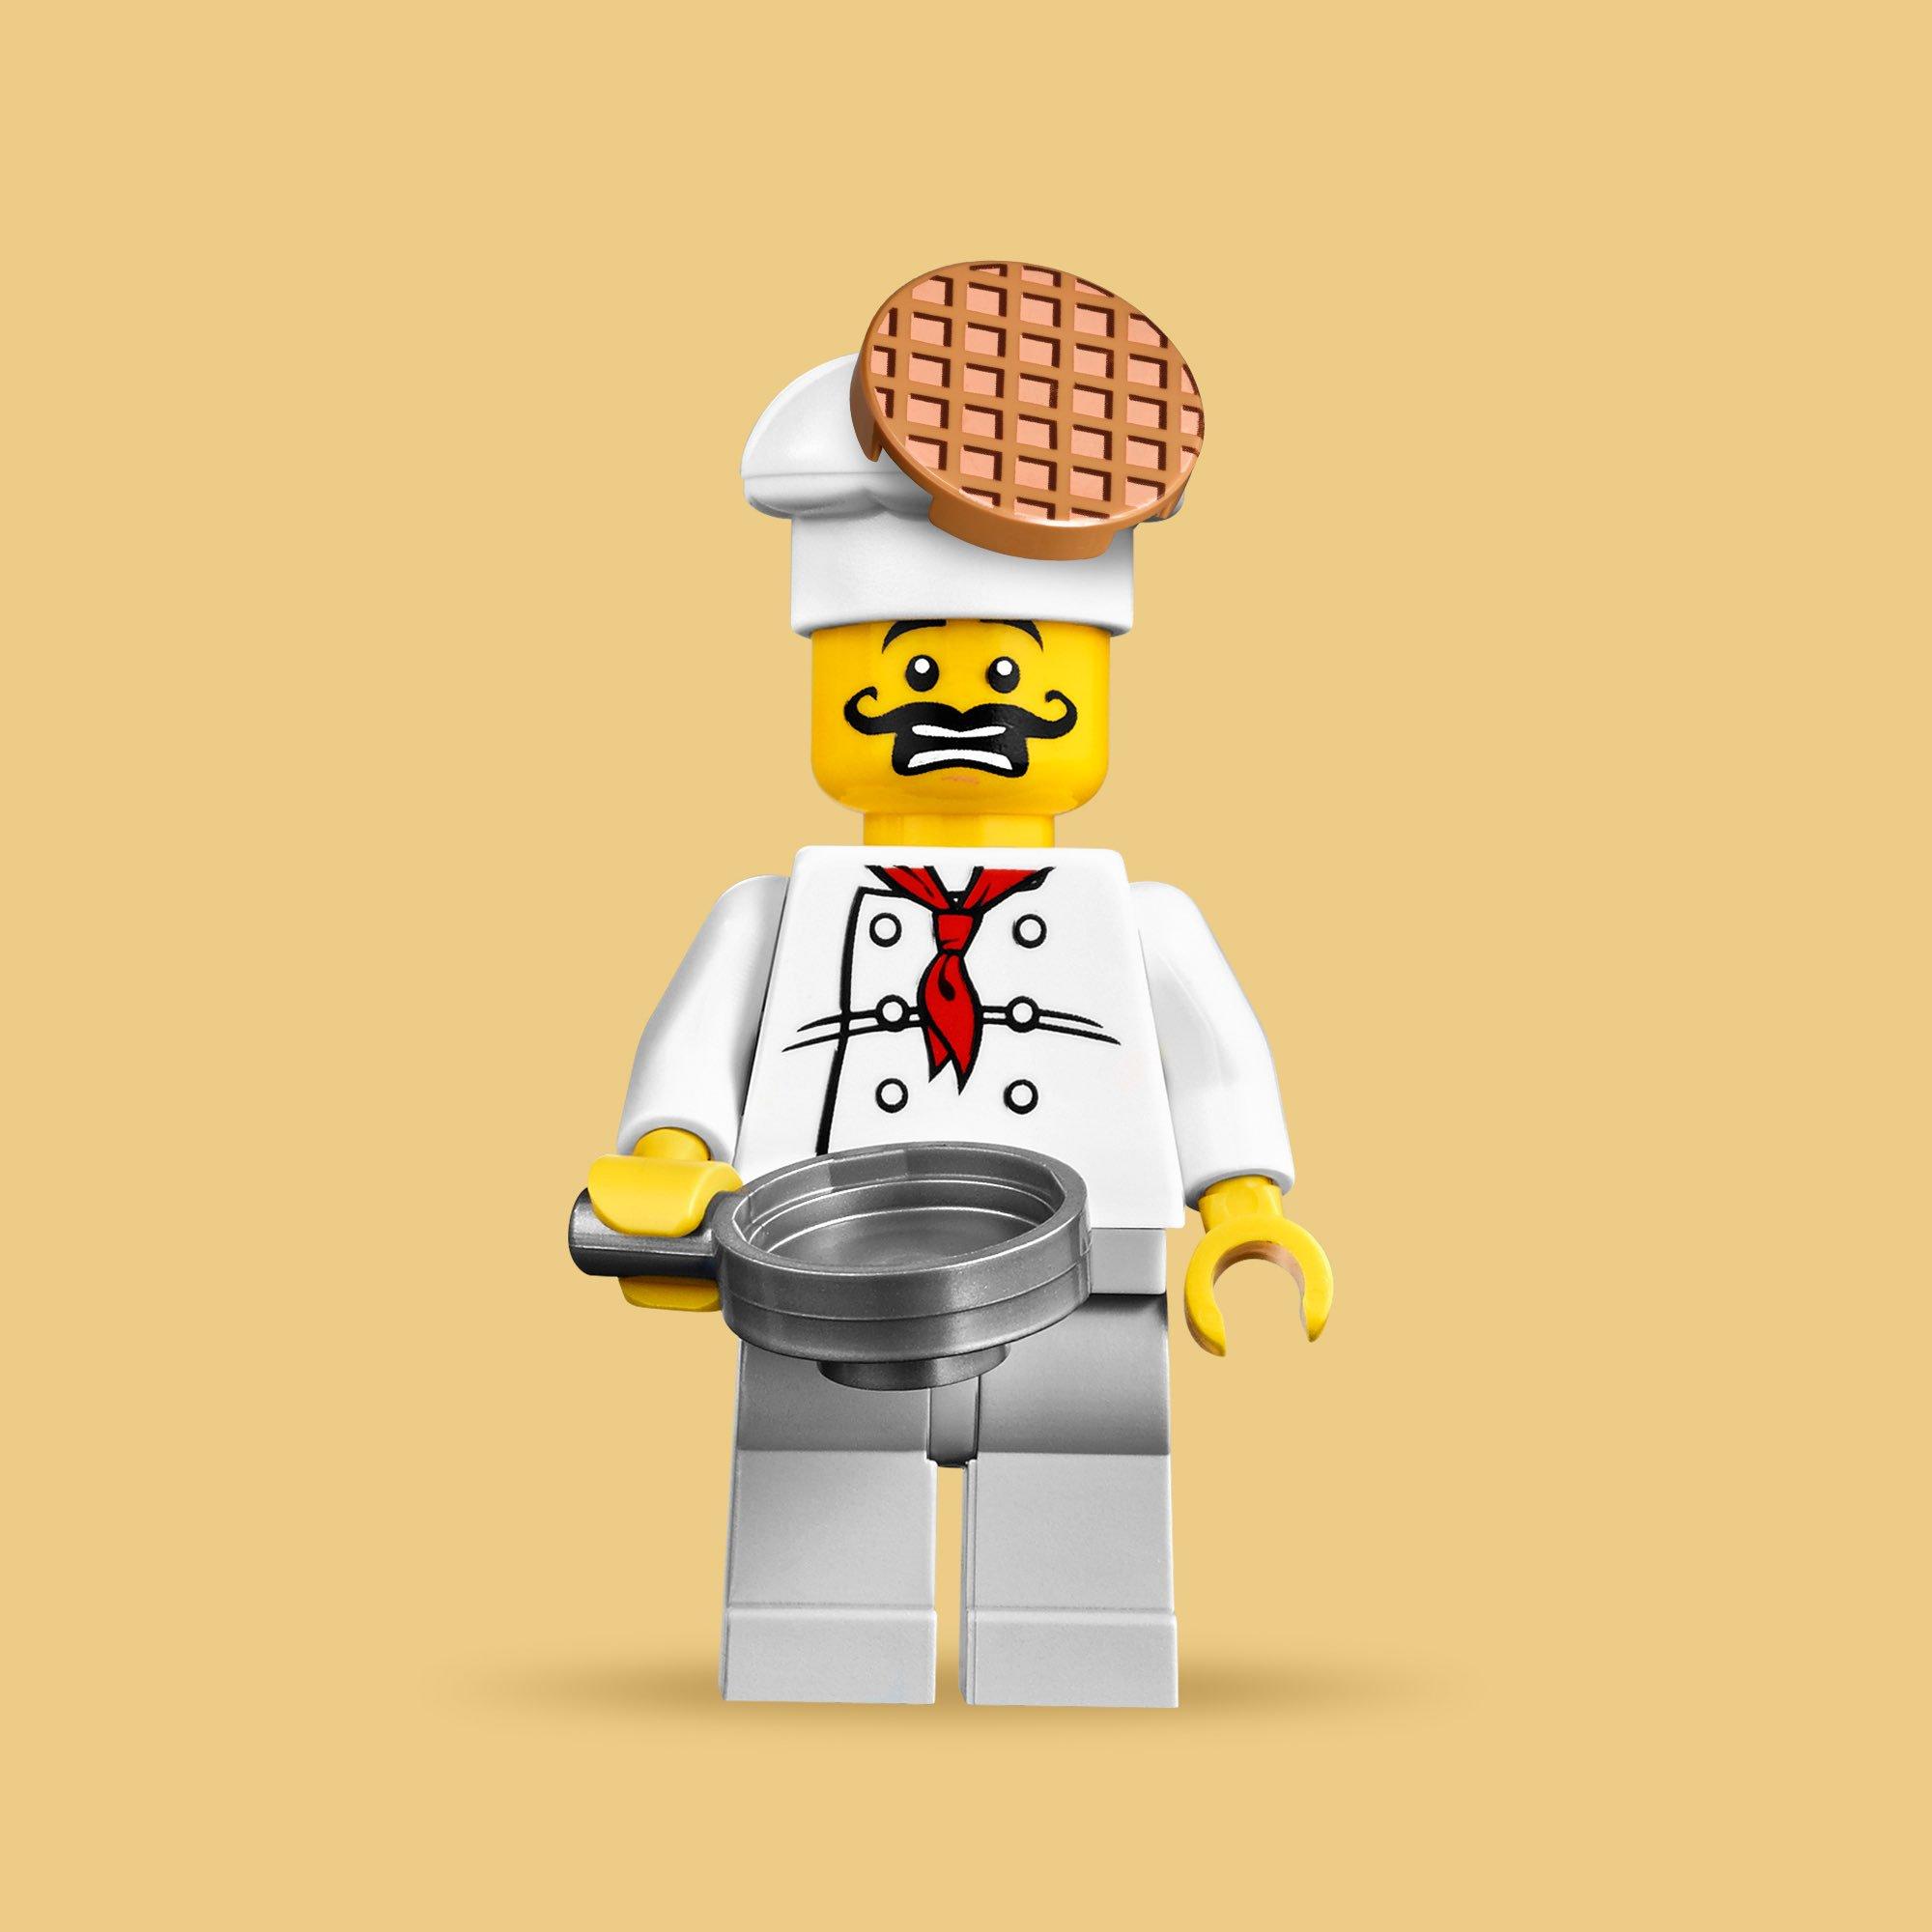 Happy #PancakeDay everyone! #TreatYourself https://t.co/e2CnJD0yZR